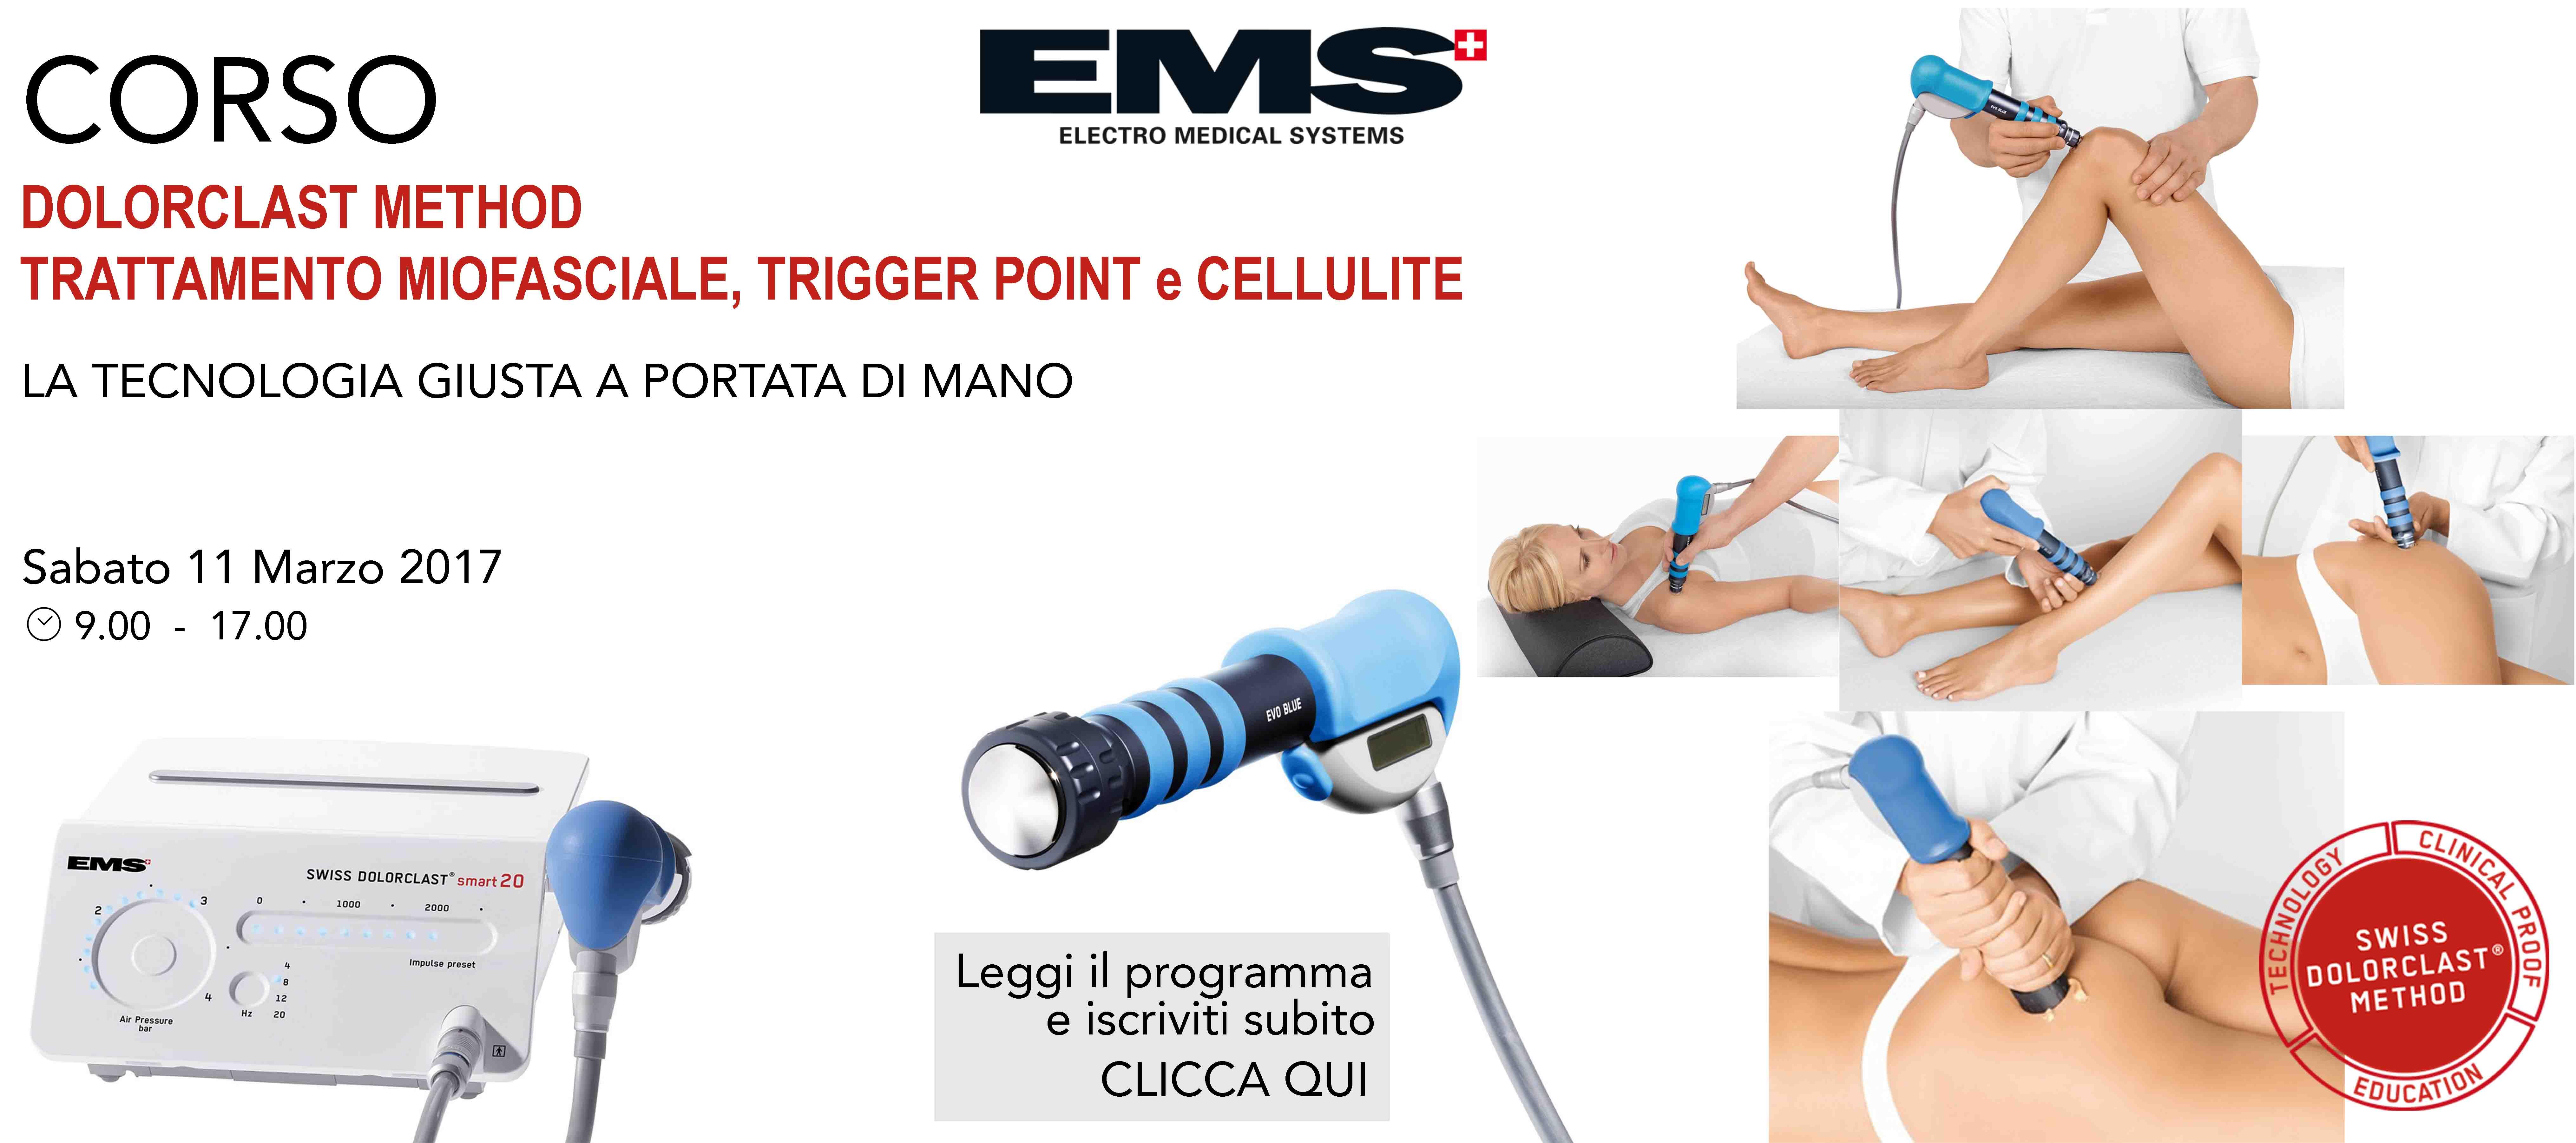 cellulite-trigger-point-e-miofasciale